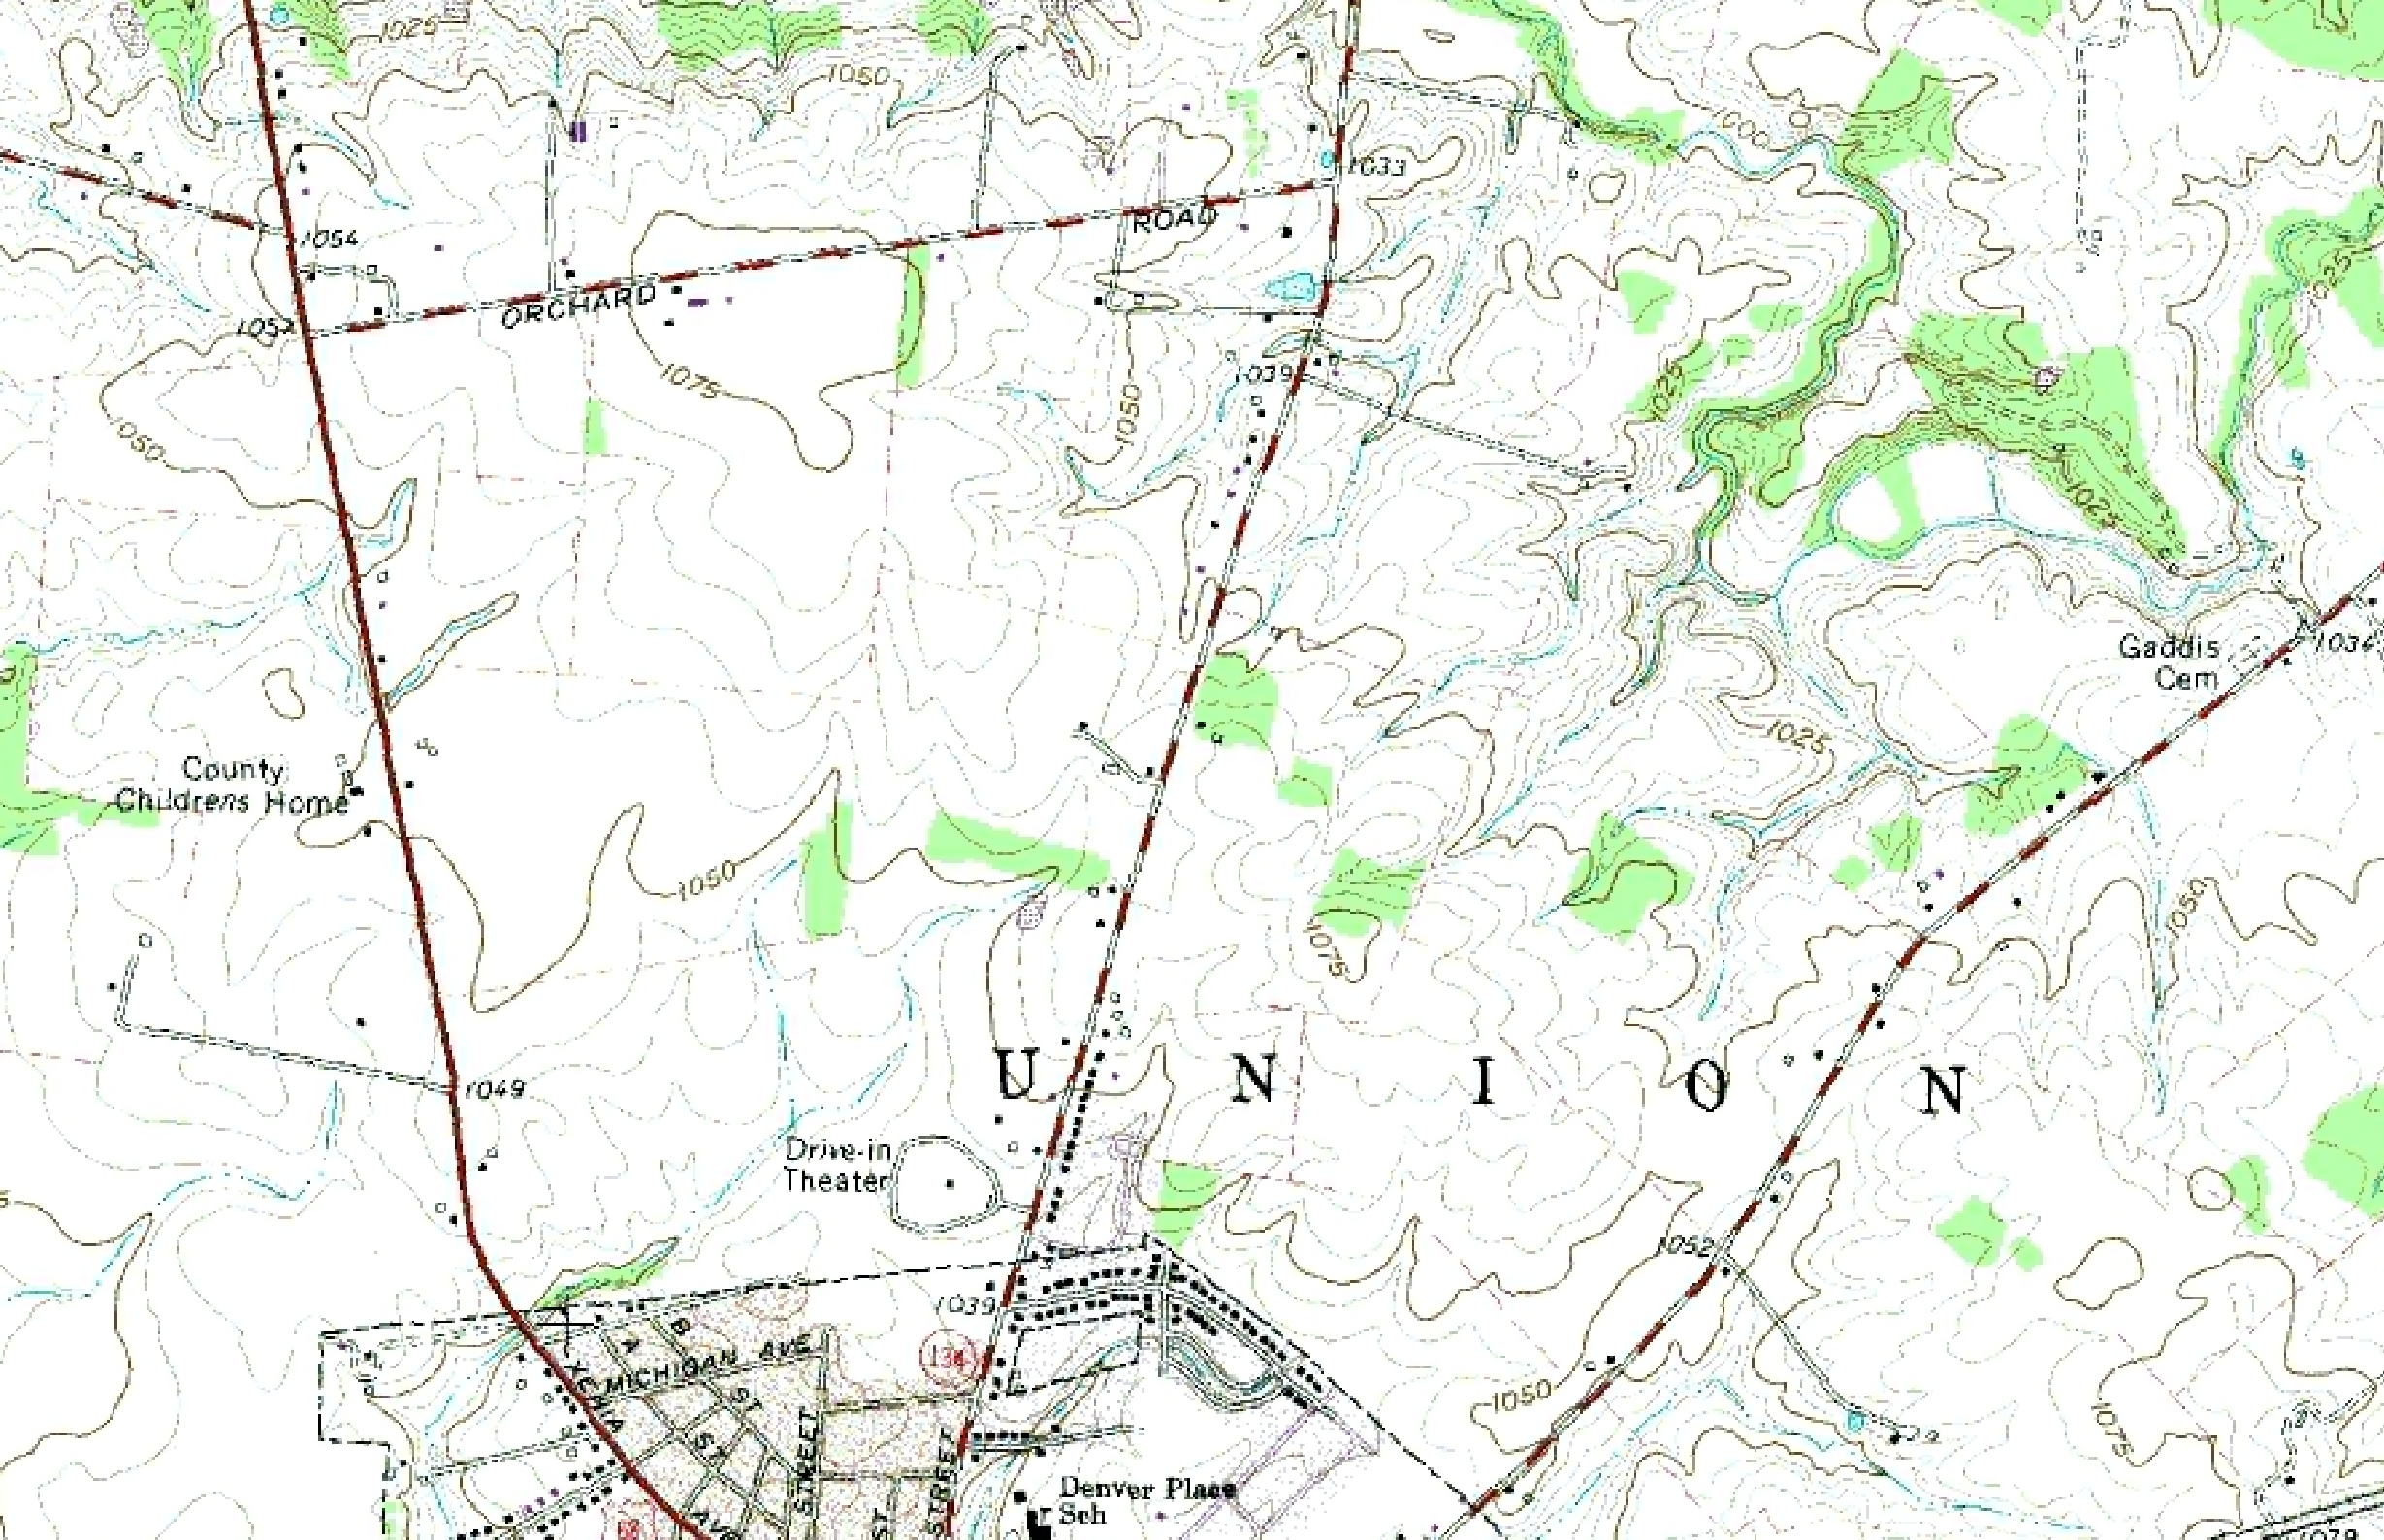 USGS - Usgs quad maps